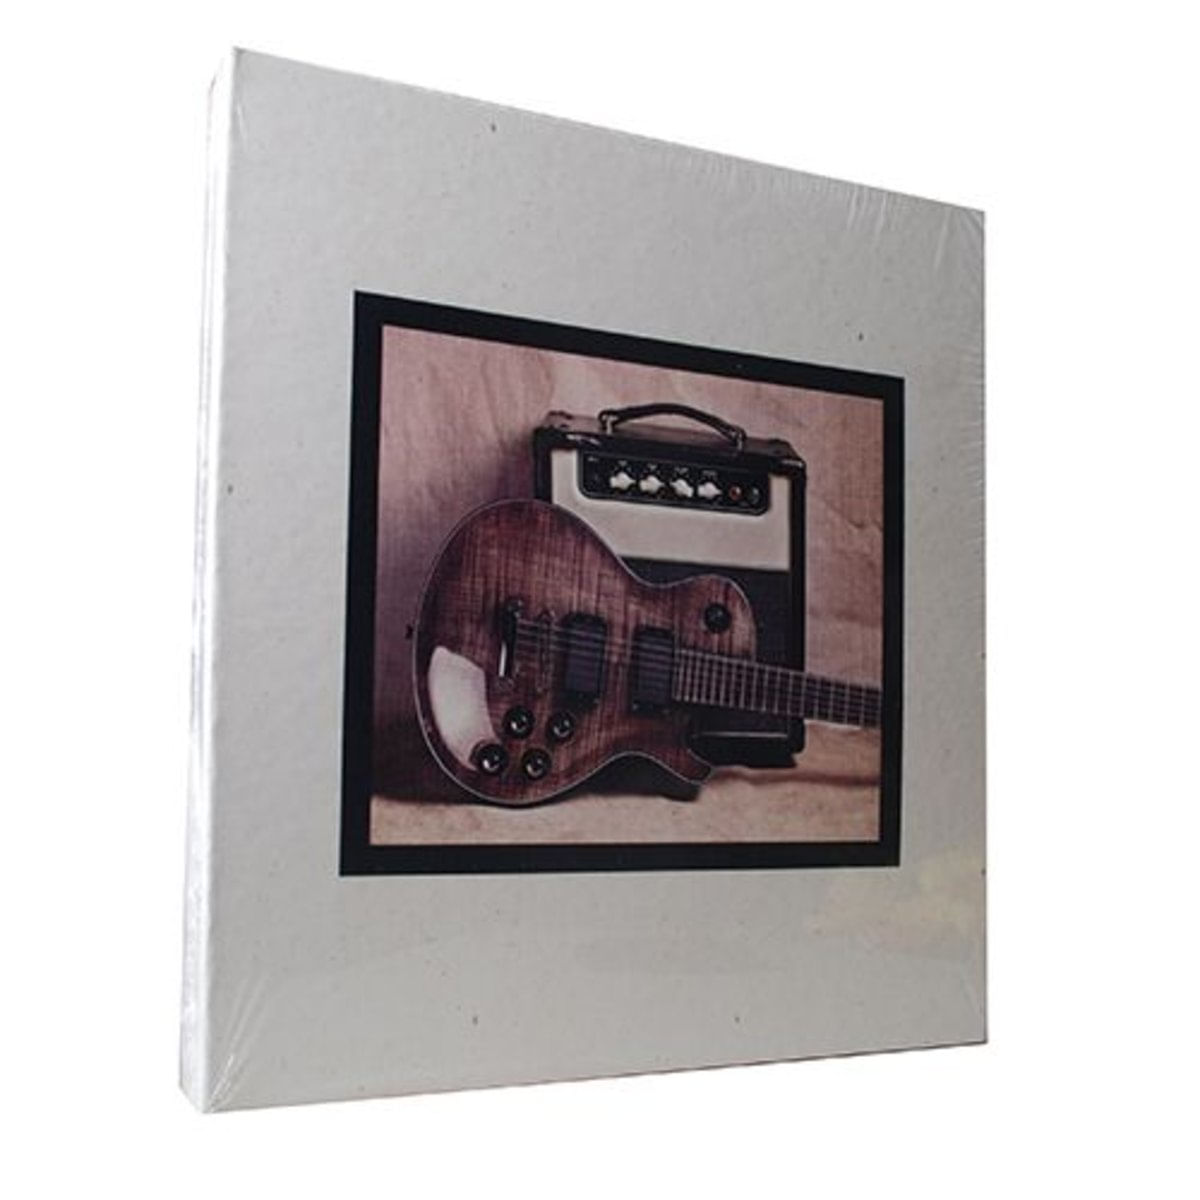 Álbum De Fotos Autocolante Ical 144